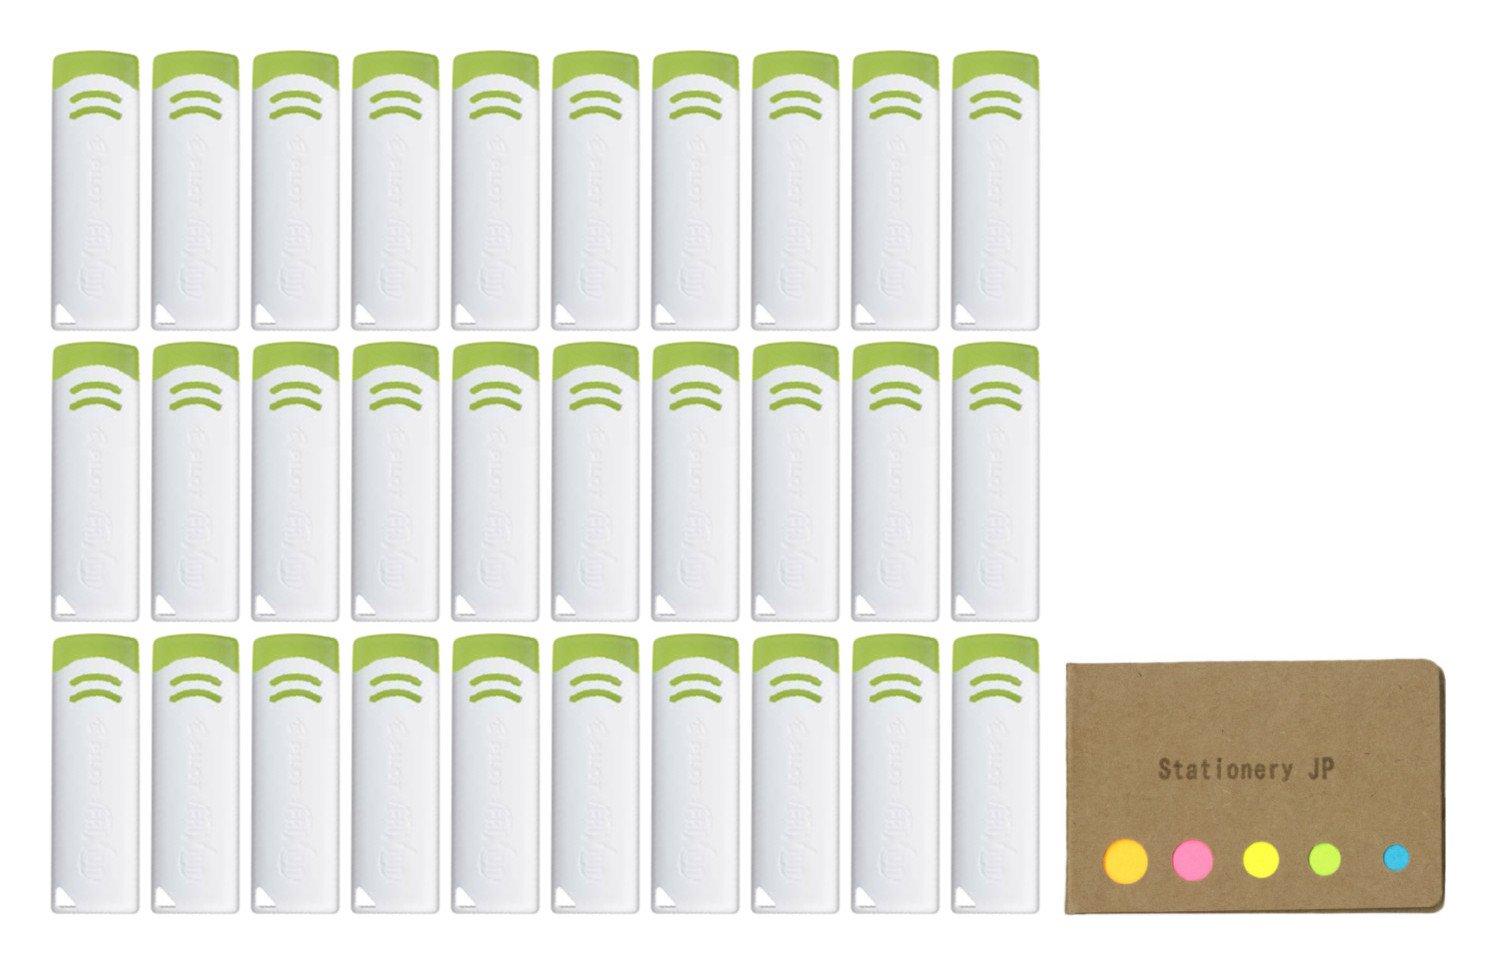 Pilot FriXion Eraser New Model, White Color, 30-pack, Sticky Notes Value Set by Stationery JP (Image #1)